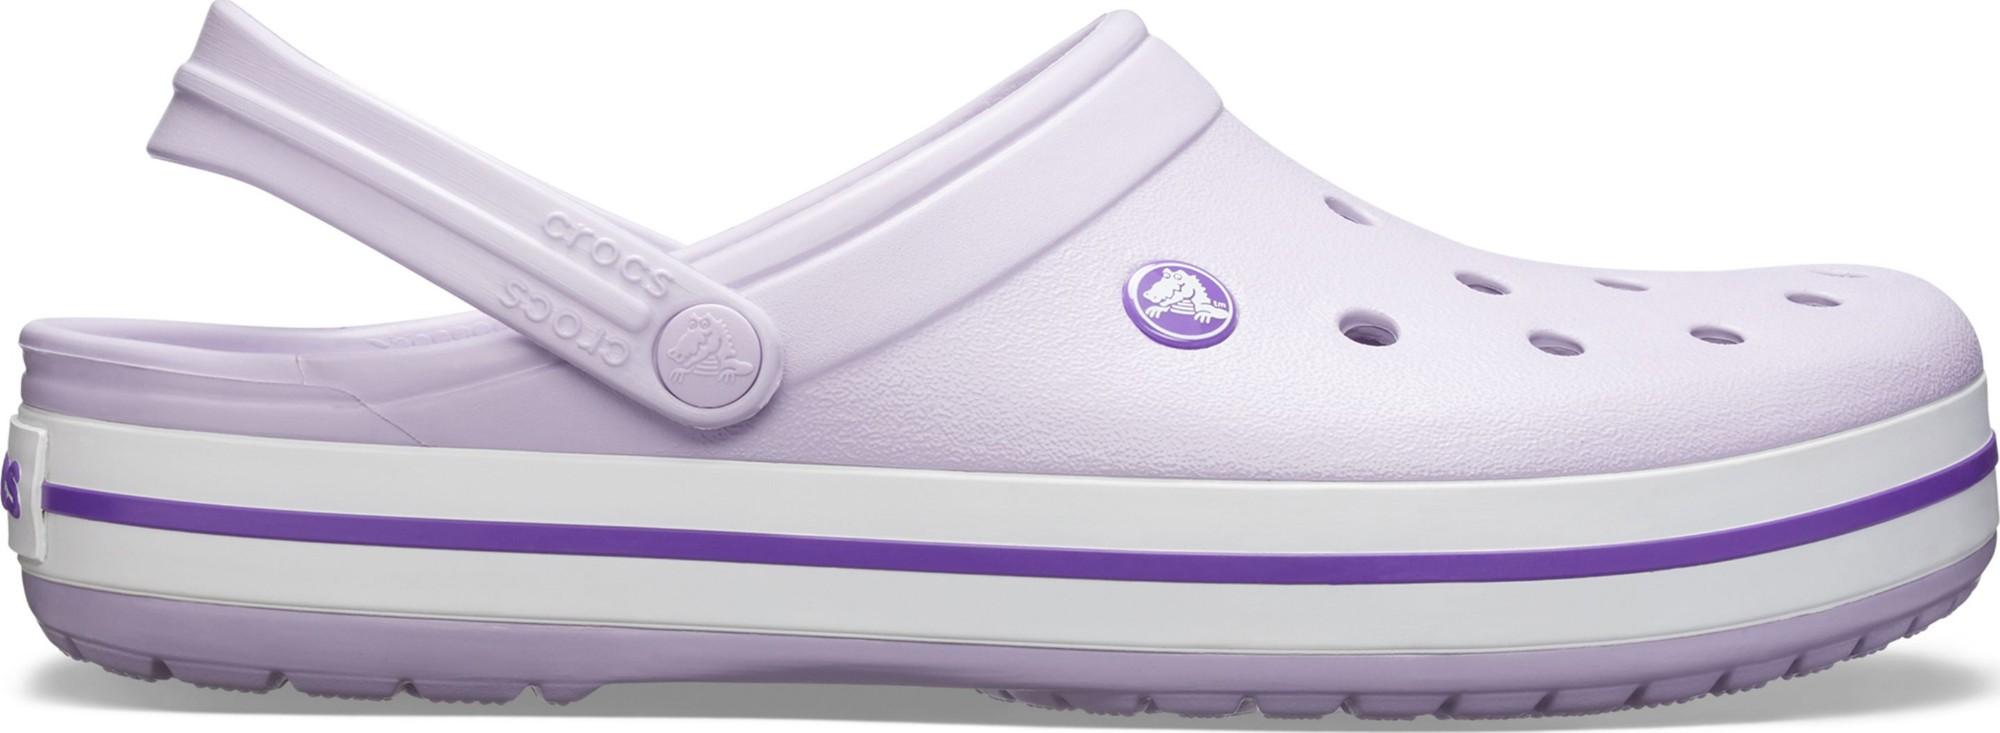 Crocs™ Crocband™ Lavender/Purple 41